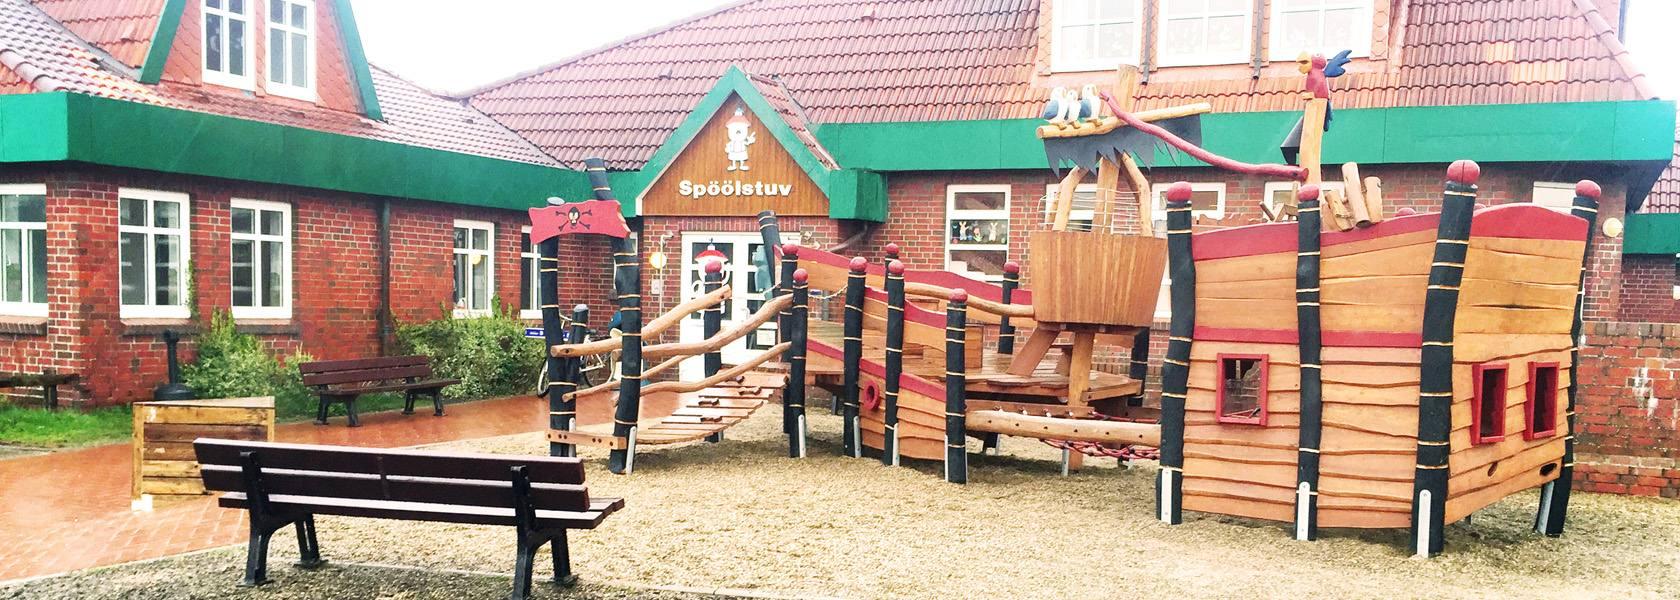 Spöölstuuv Langeoog, © Tourismus-Service Langeoog